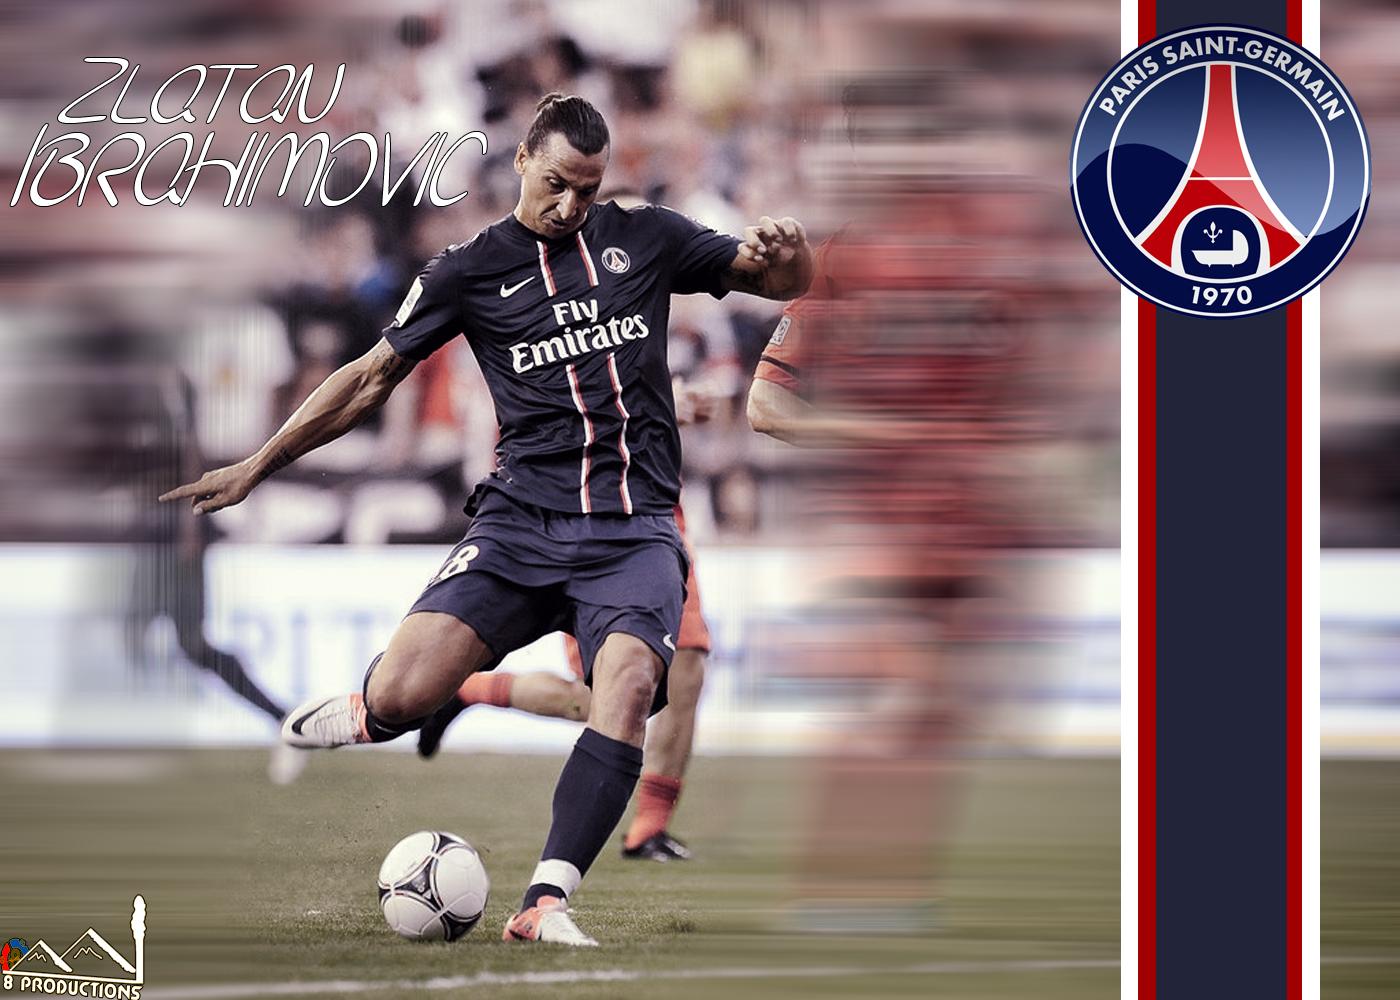 http://4.bp.blogspot.com/-zRiDrYMUrTM/UBWlCHU_23I/AAAAAAAADRc/UREZ0FjDu4U/s1600/PSG-Ibrahimovic.jpg